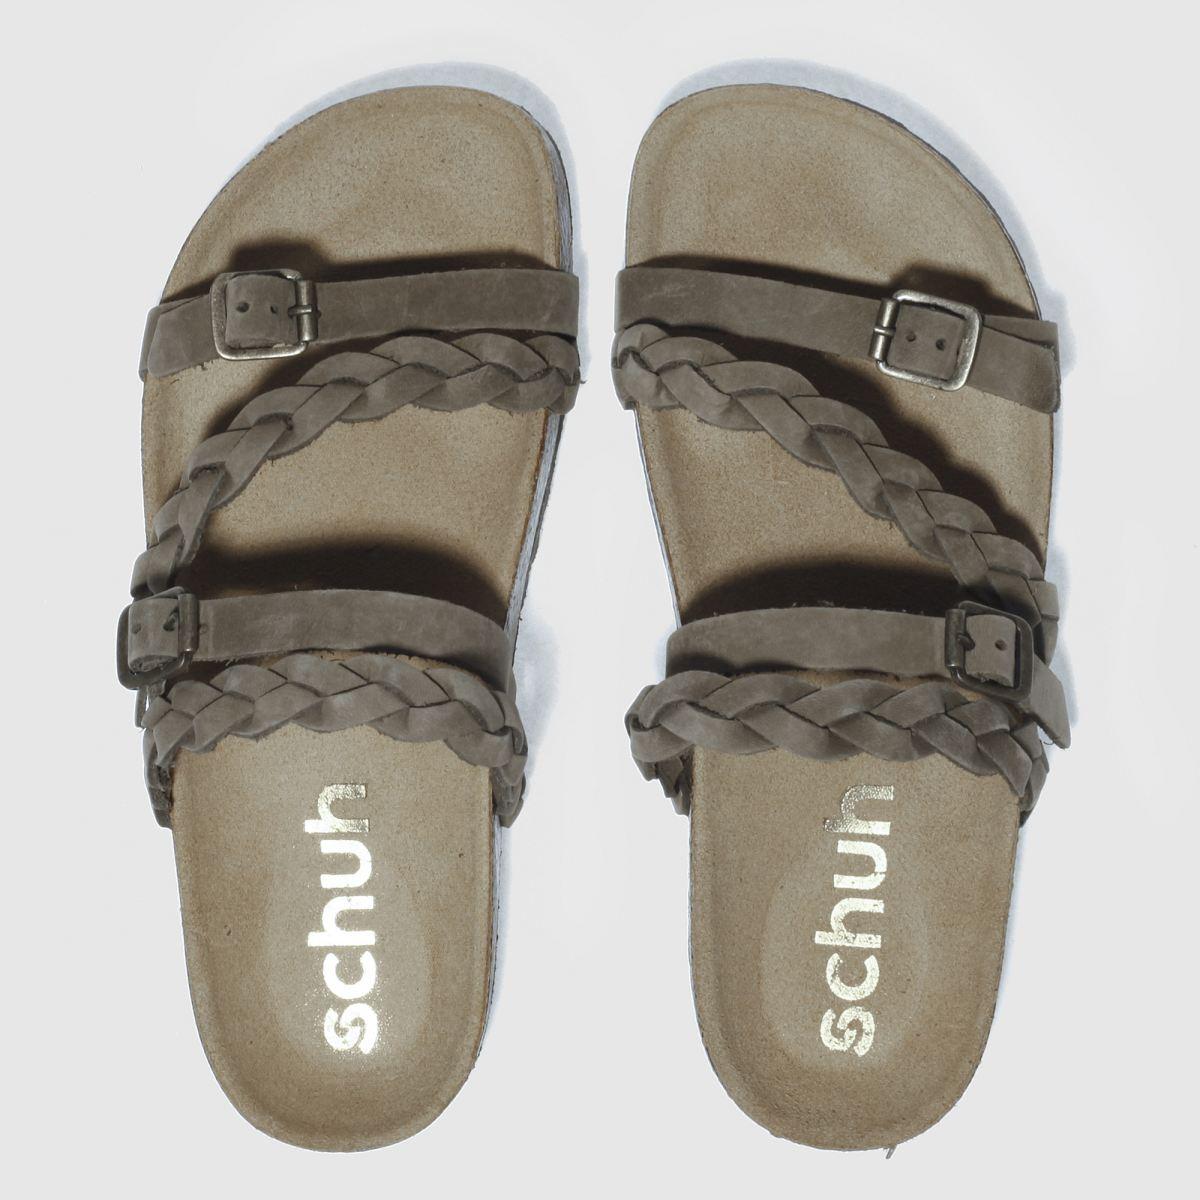 schuh khaki zodiac sandals